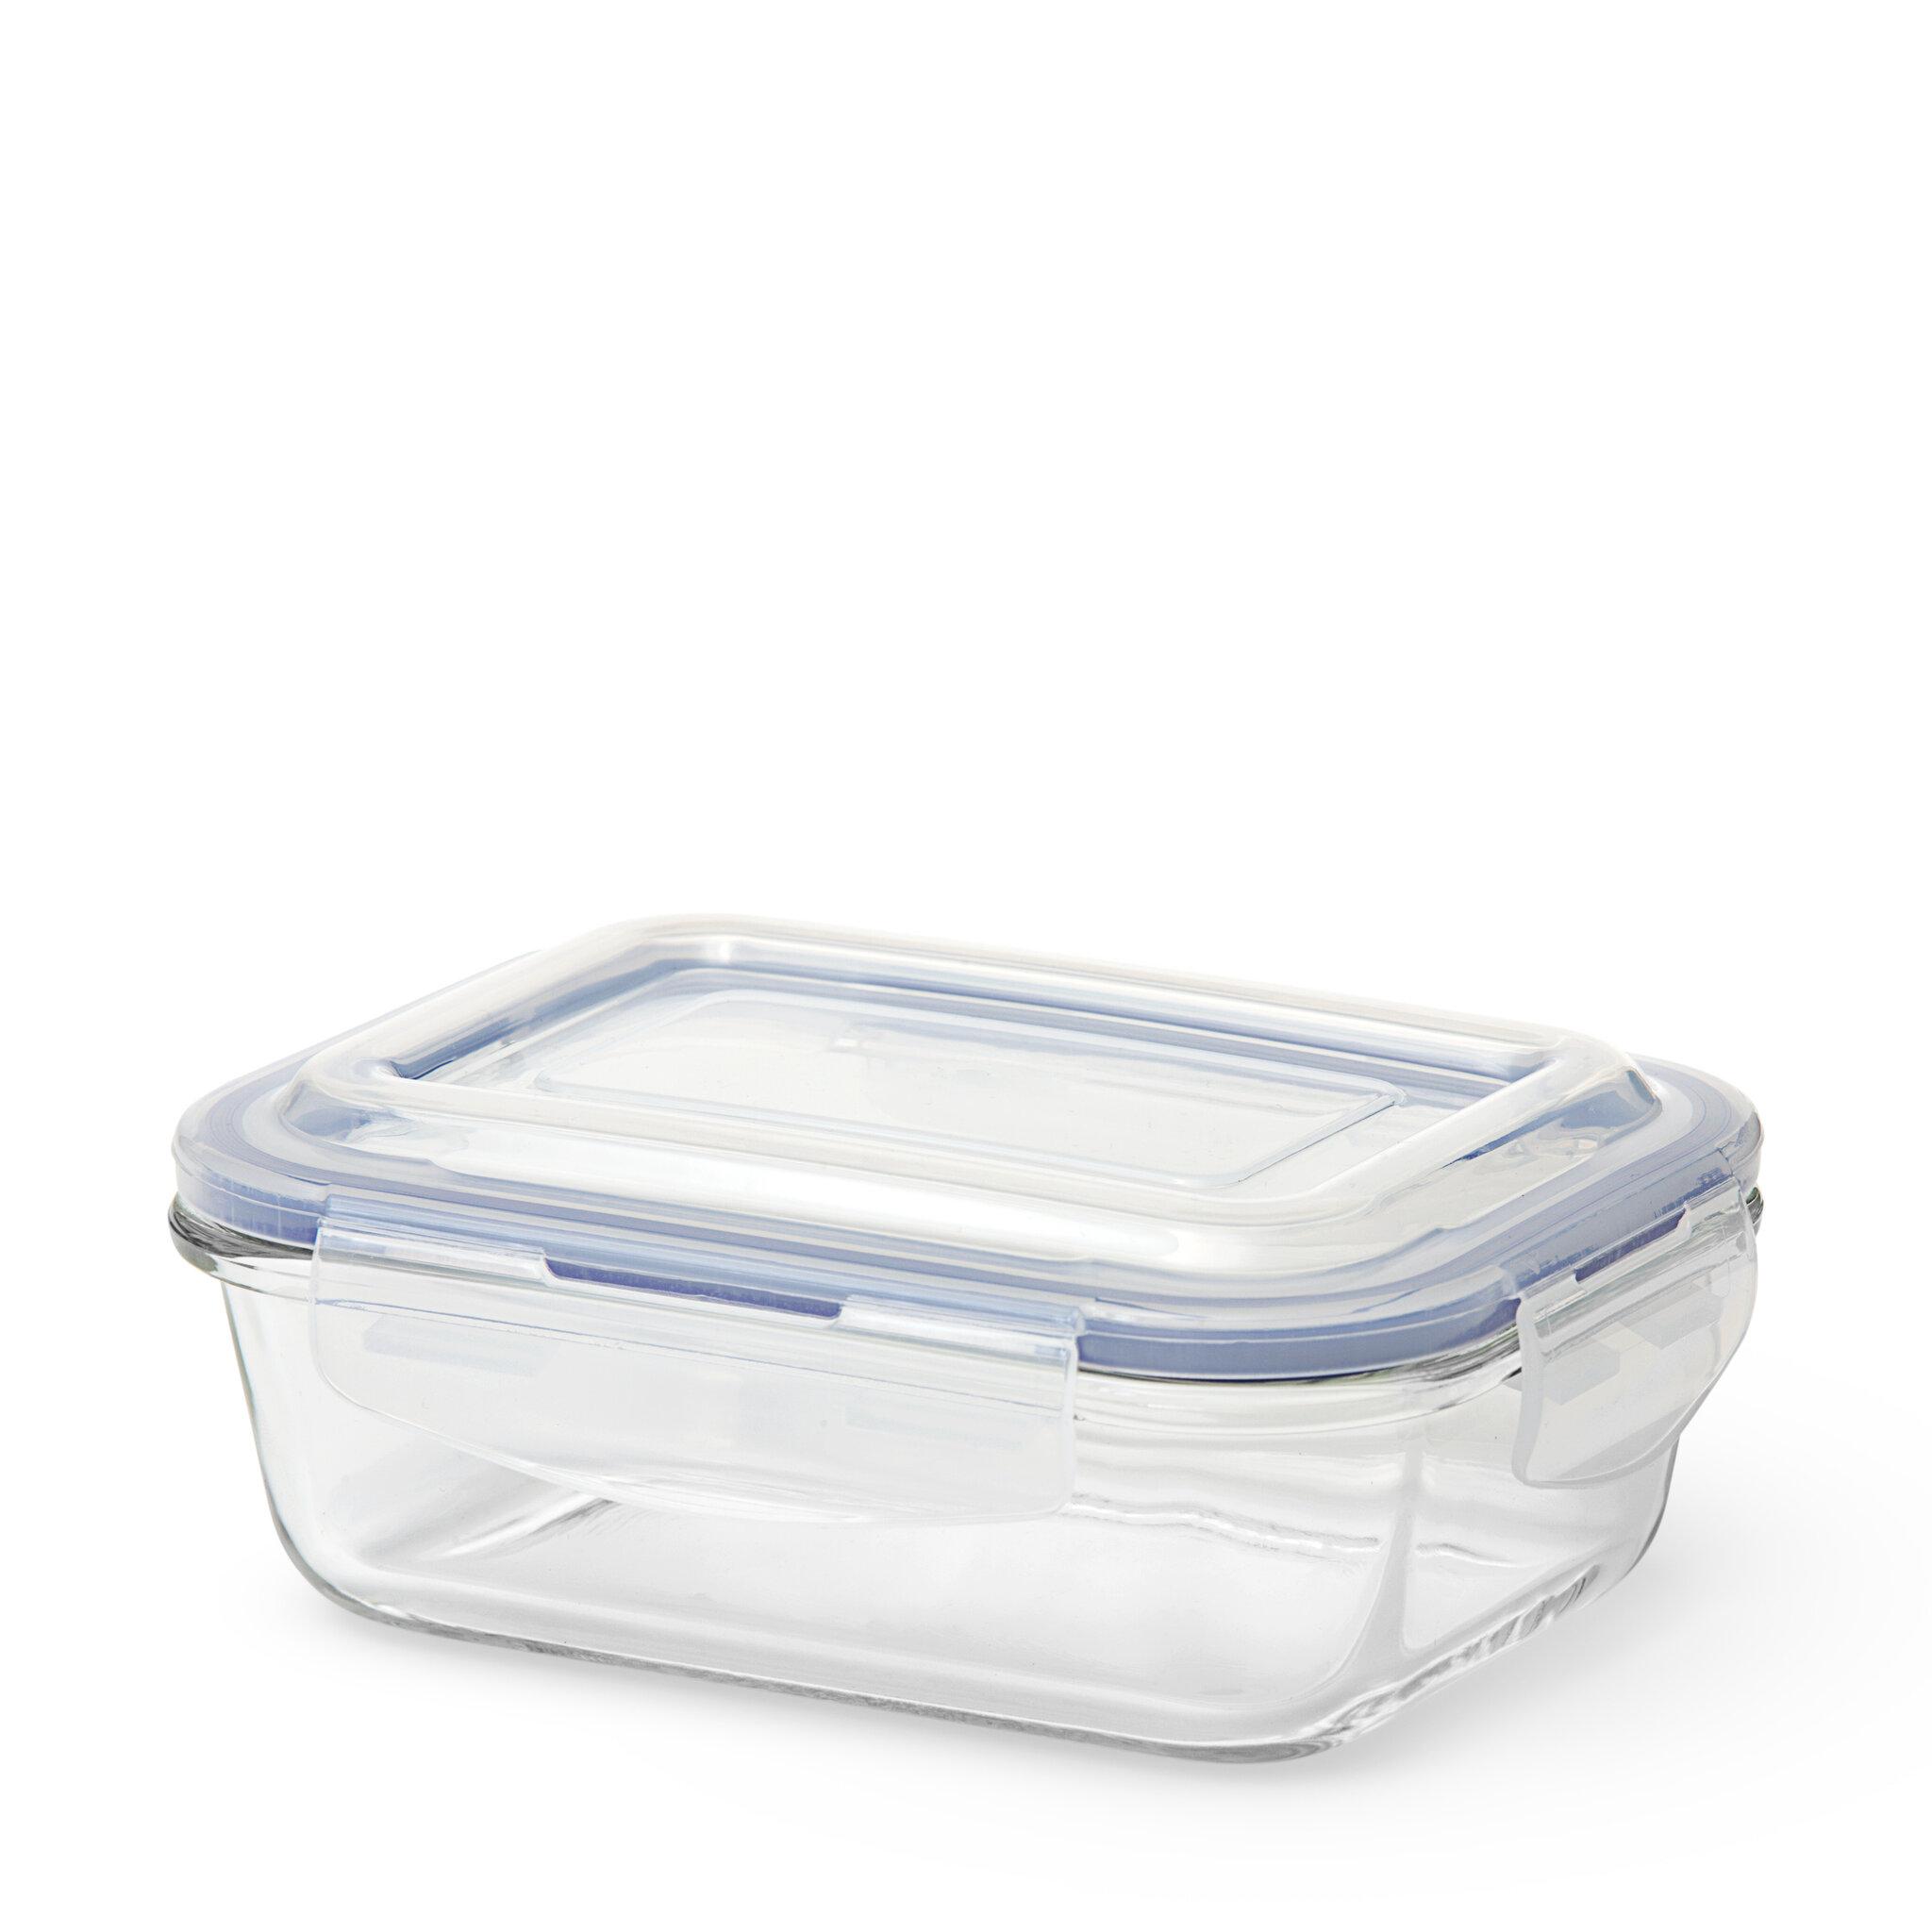 Matlåda, glas, 550ml